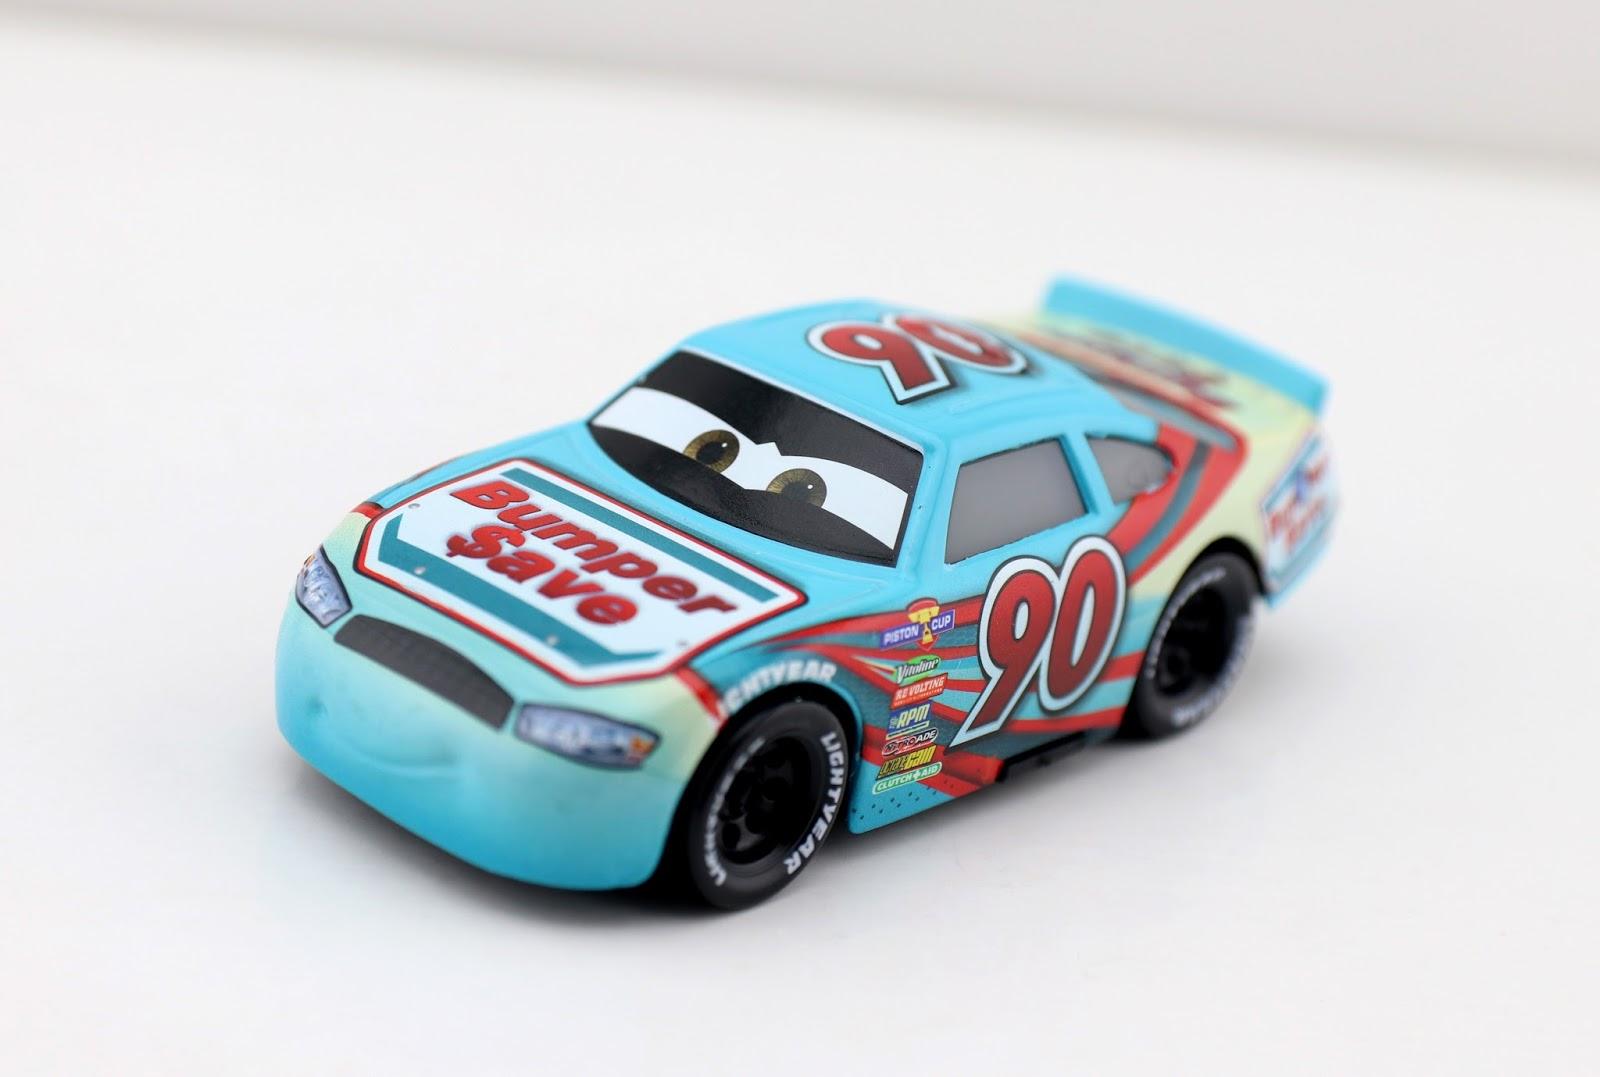 Cars 3: Ponchy Wipeout (Bumper Save) mattel diecast